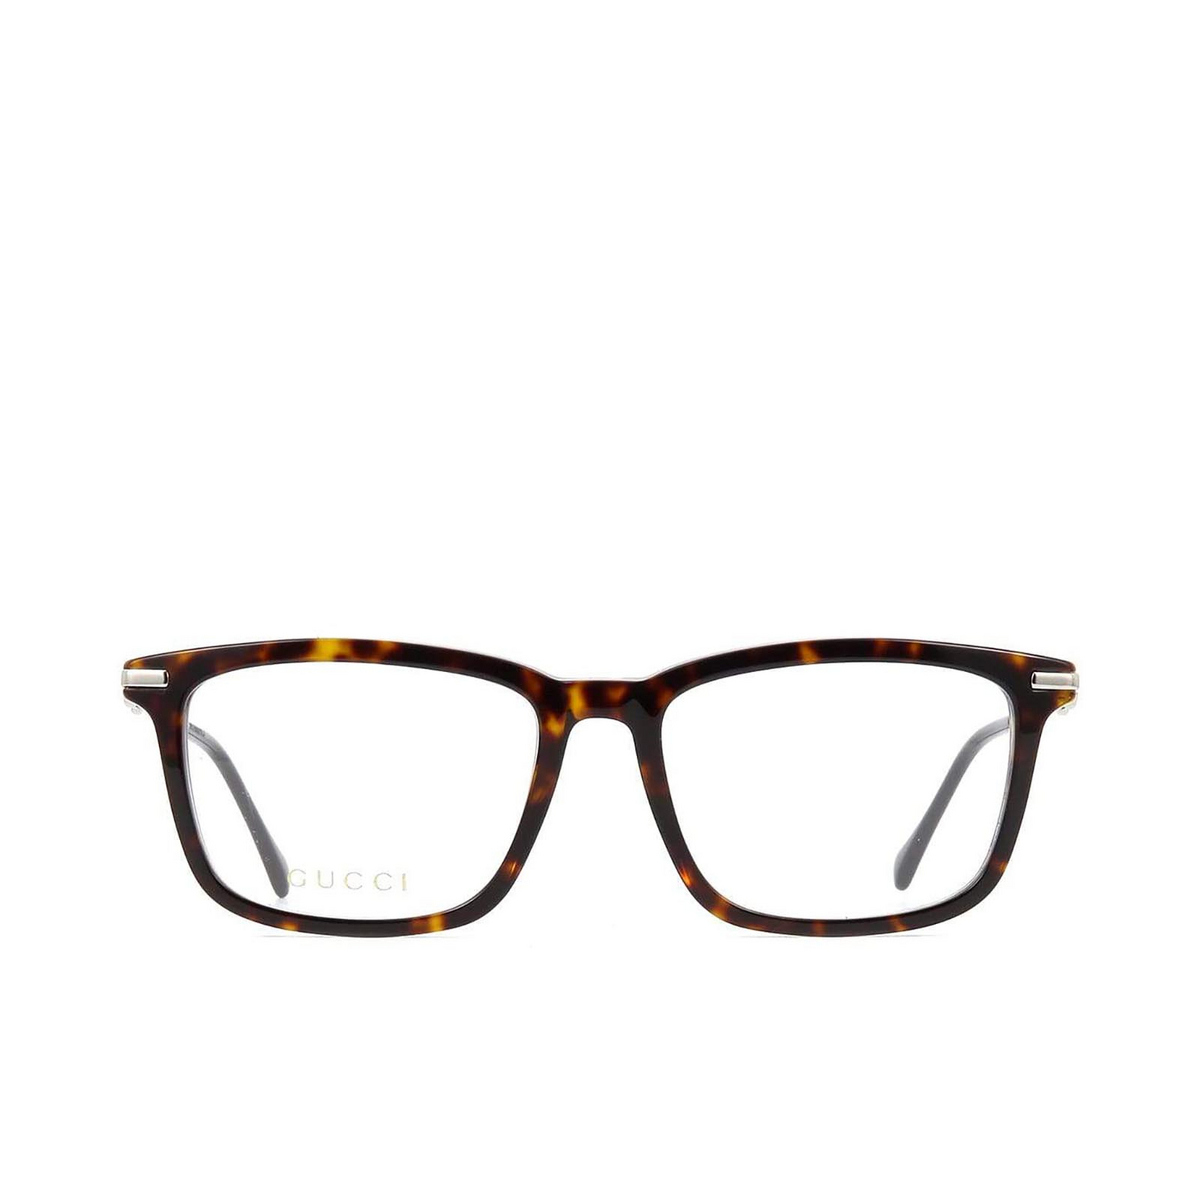 Gucci® Rectangle Eyeglasses: GG0920O color Dark Havana 005 - front view.